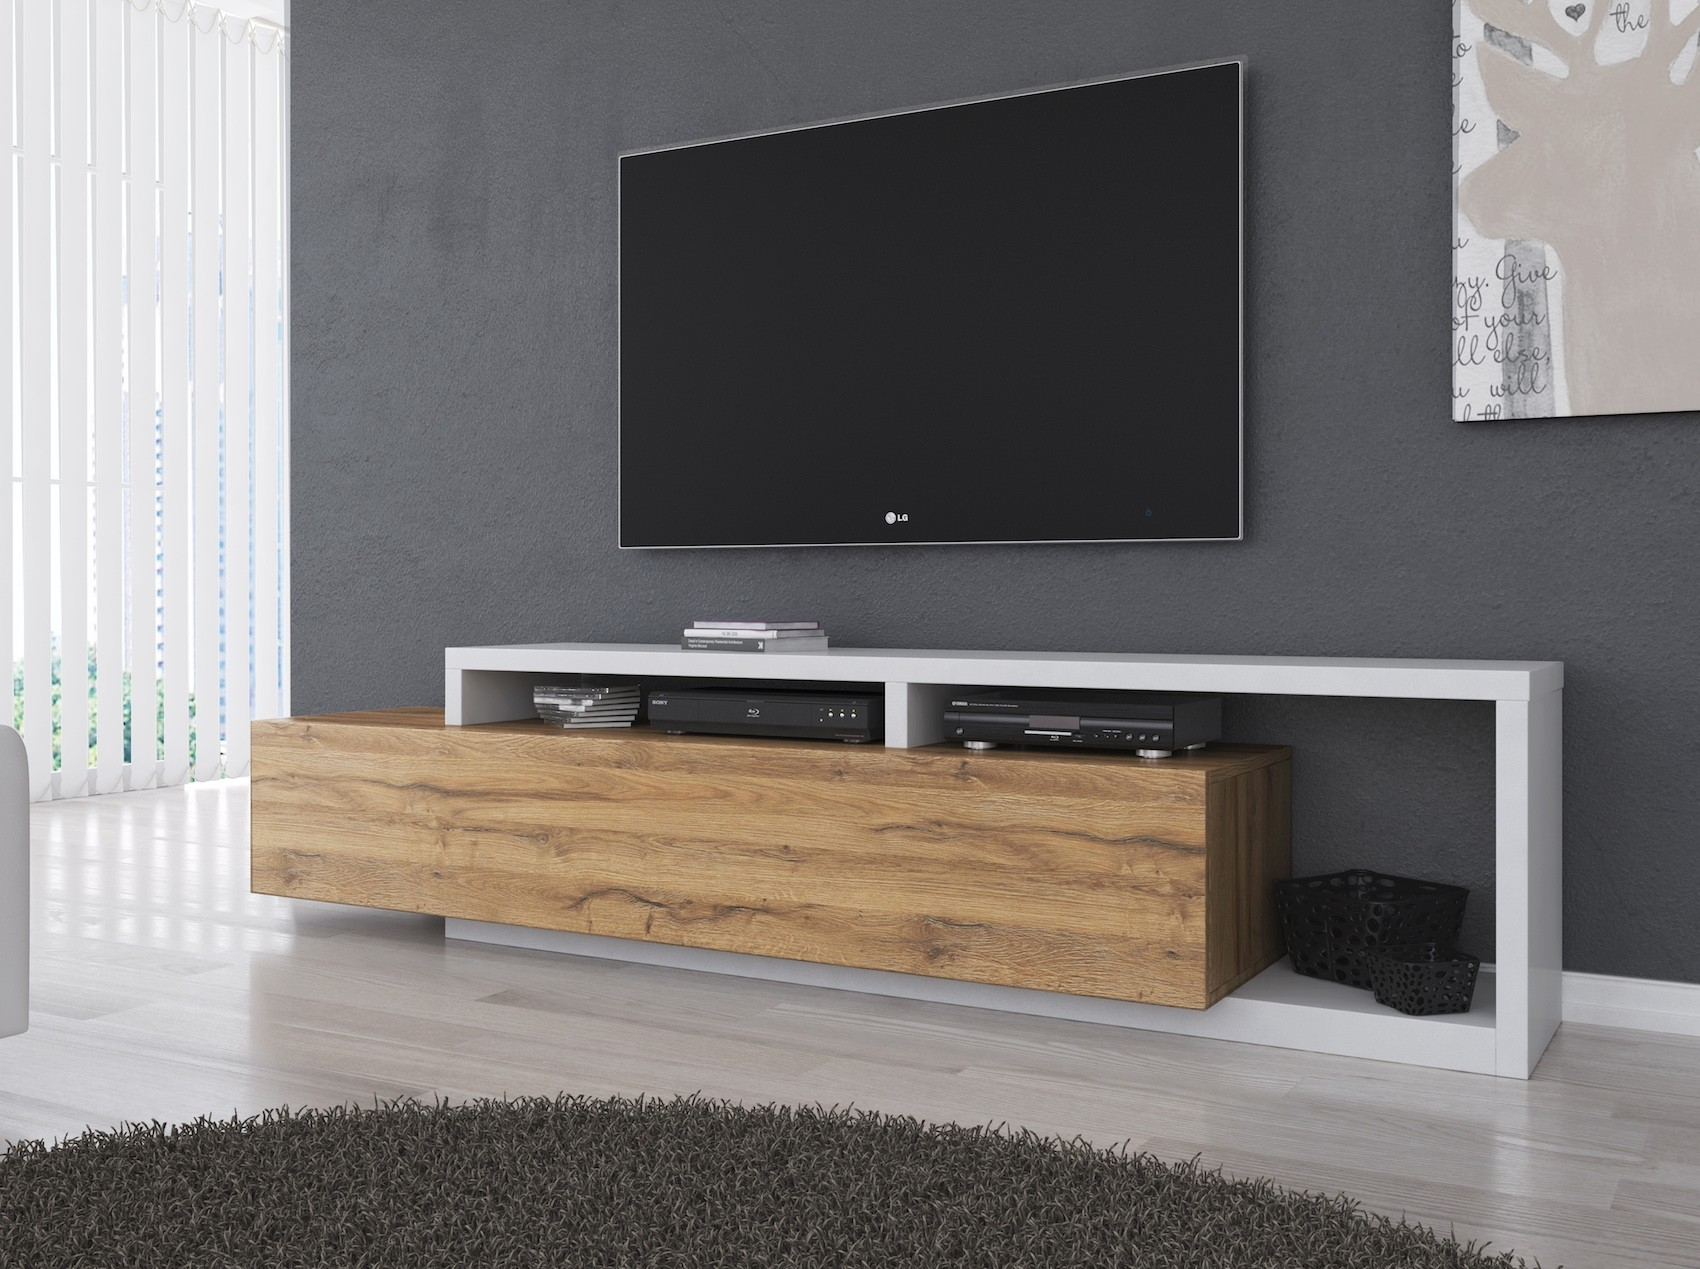 Gratis Eiken Tv Kast.Tv Meubel Bello Eiken Wit 219 Cm Meubella